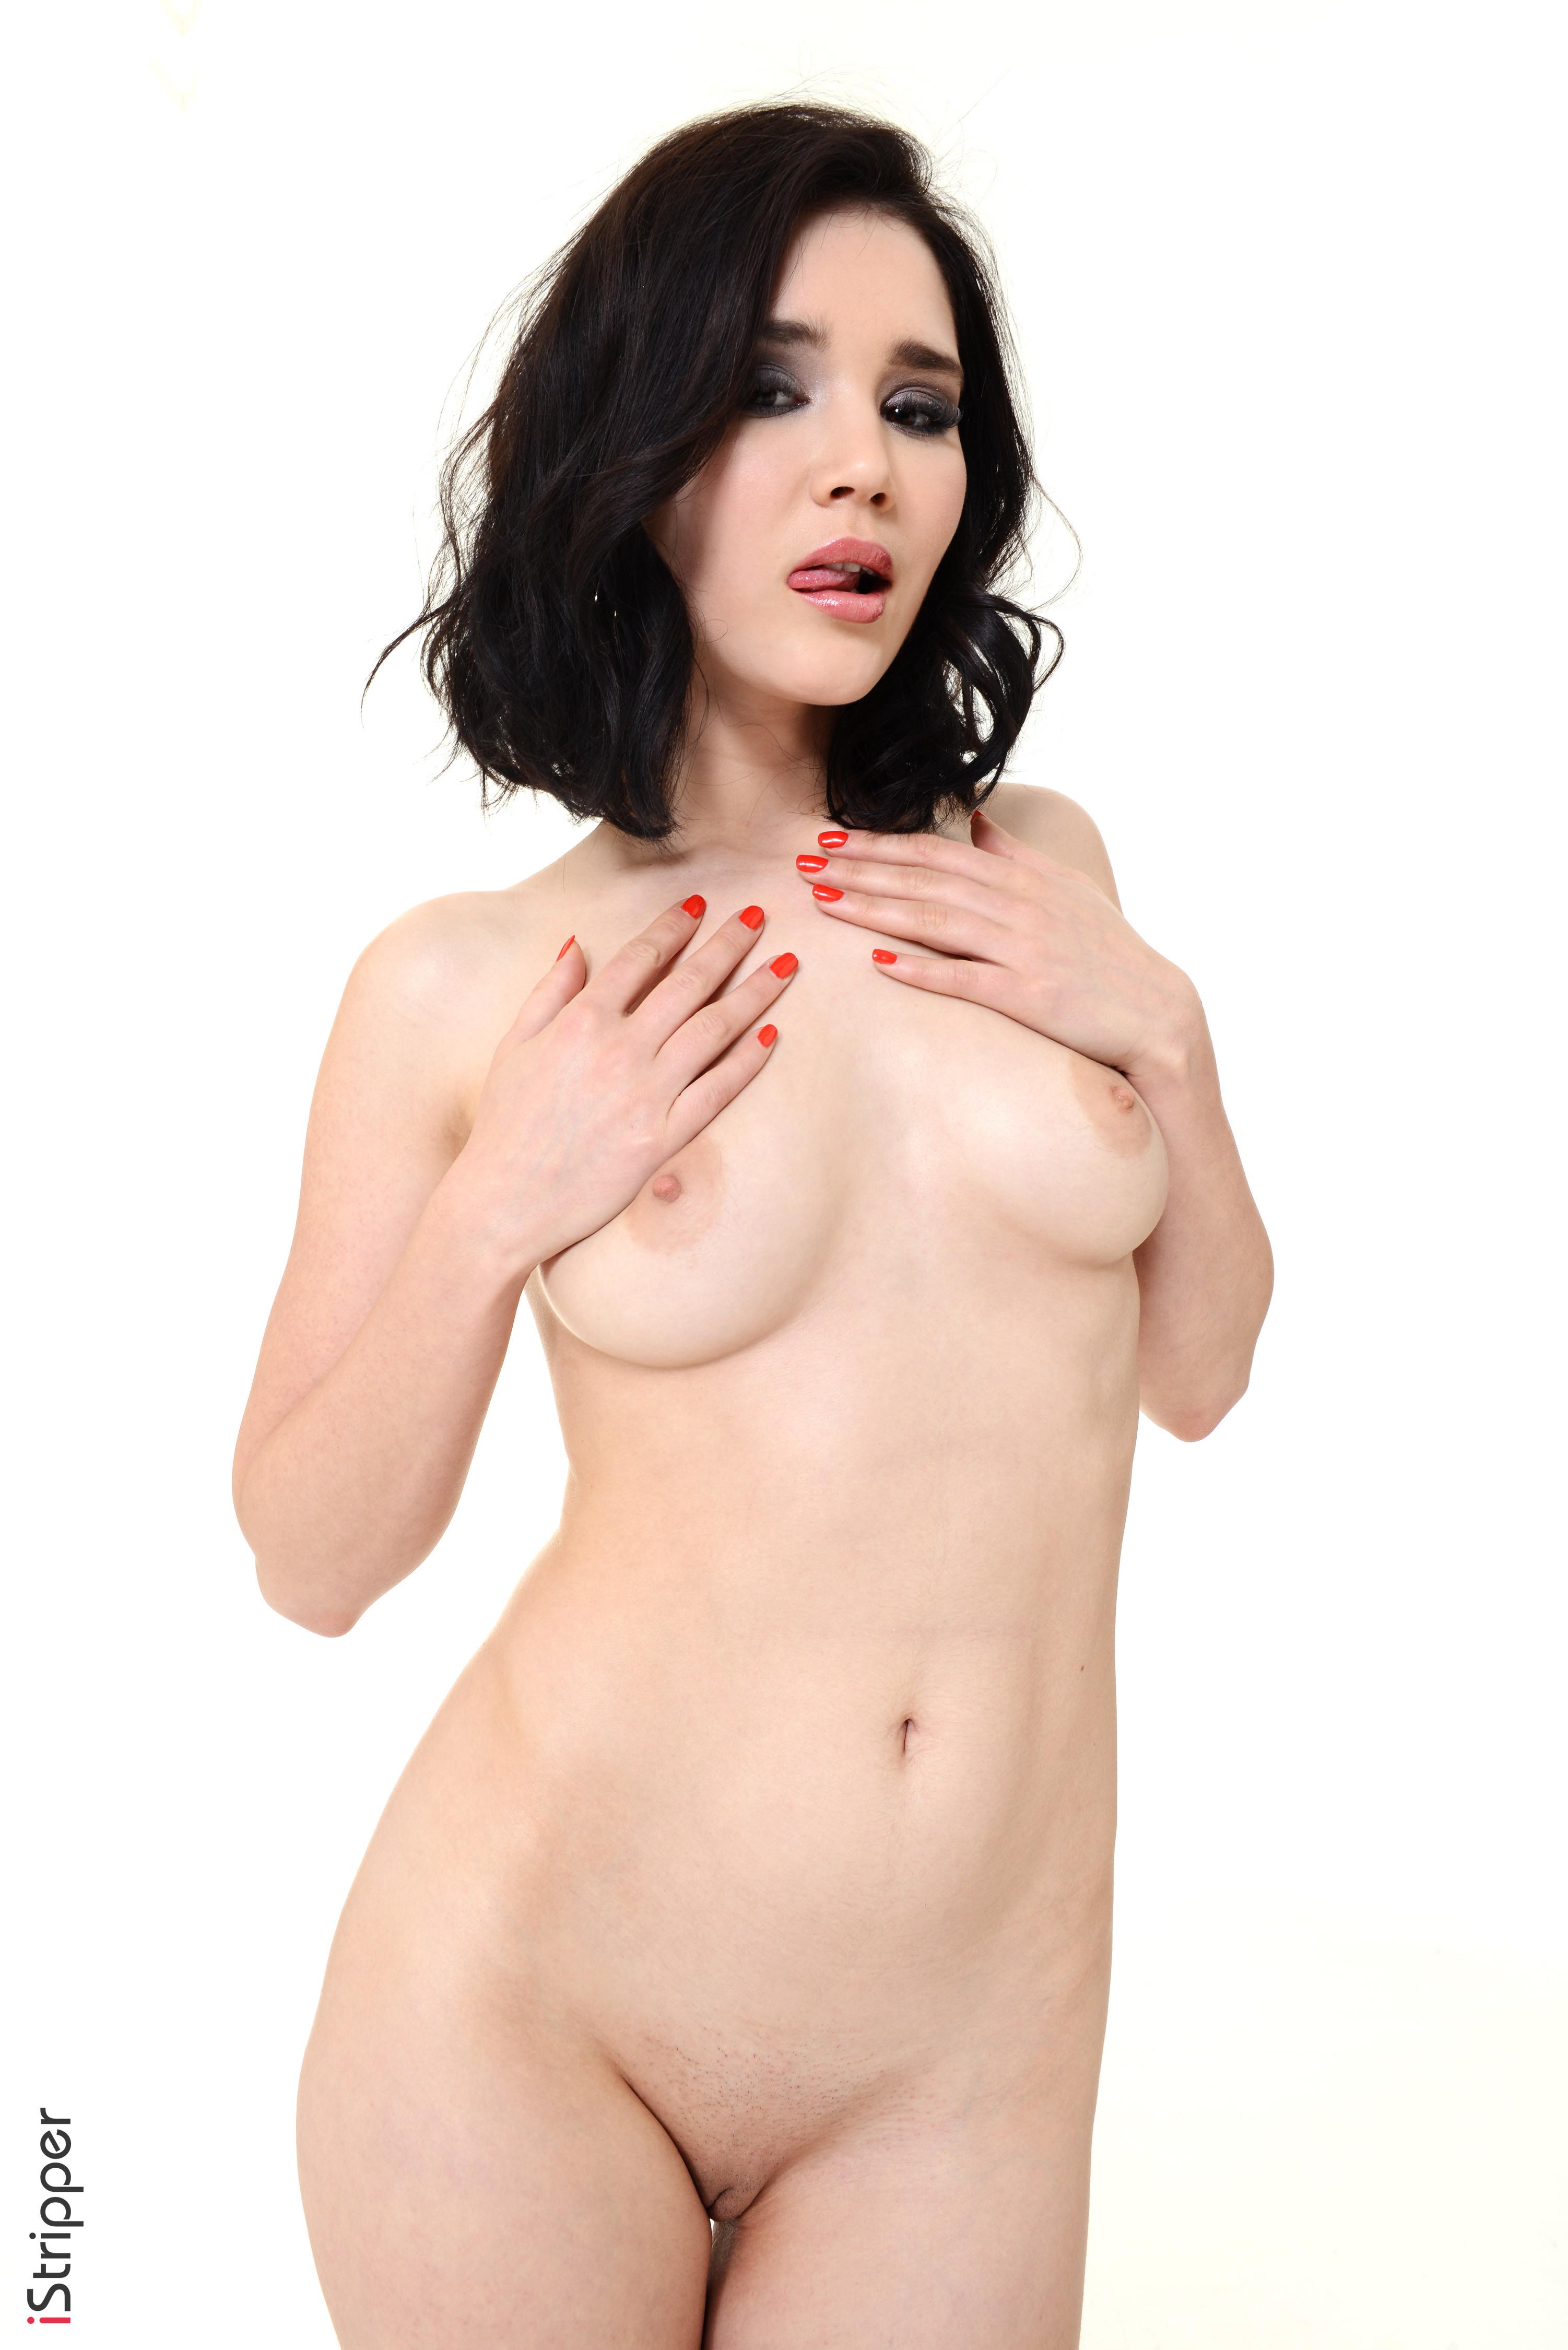 girls stripping nude tumblr